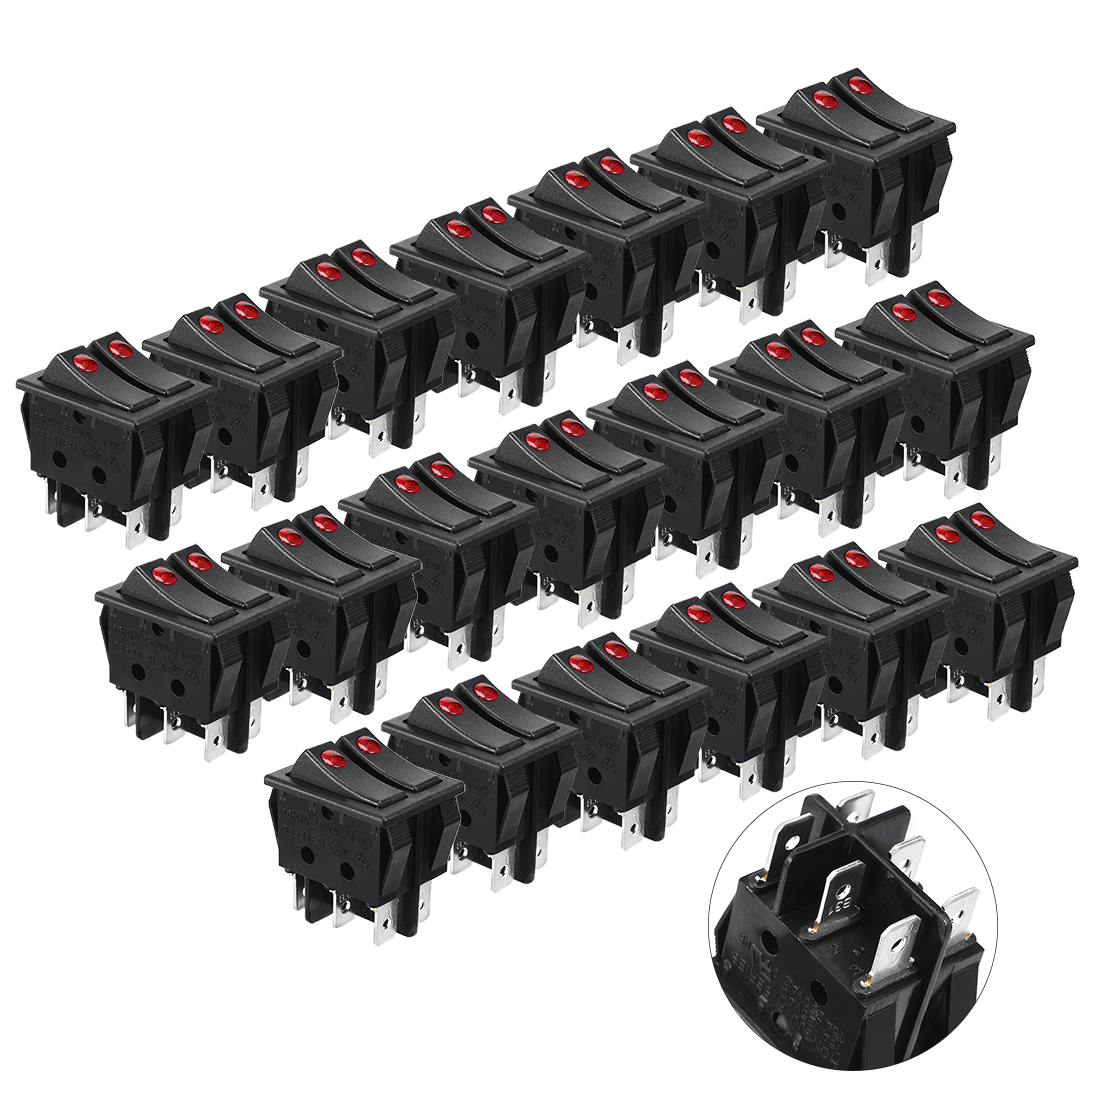 6 Pins Double On/Off Illuminated SPST Rocker Switch 16A 250VAC 20 Pcs